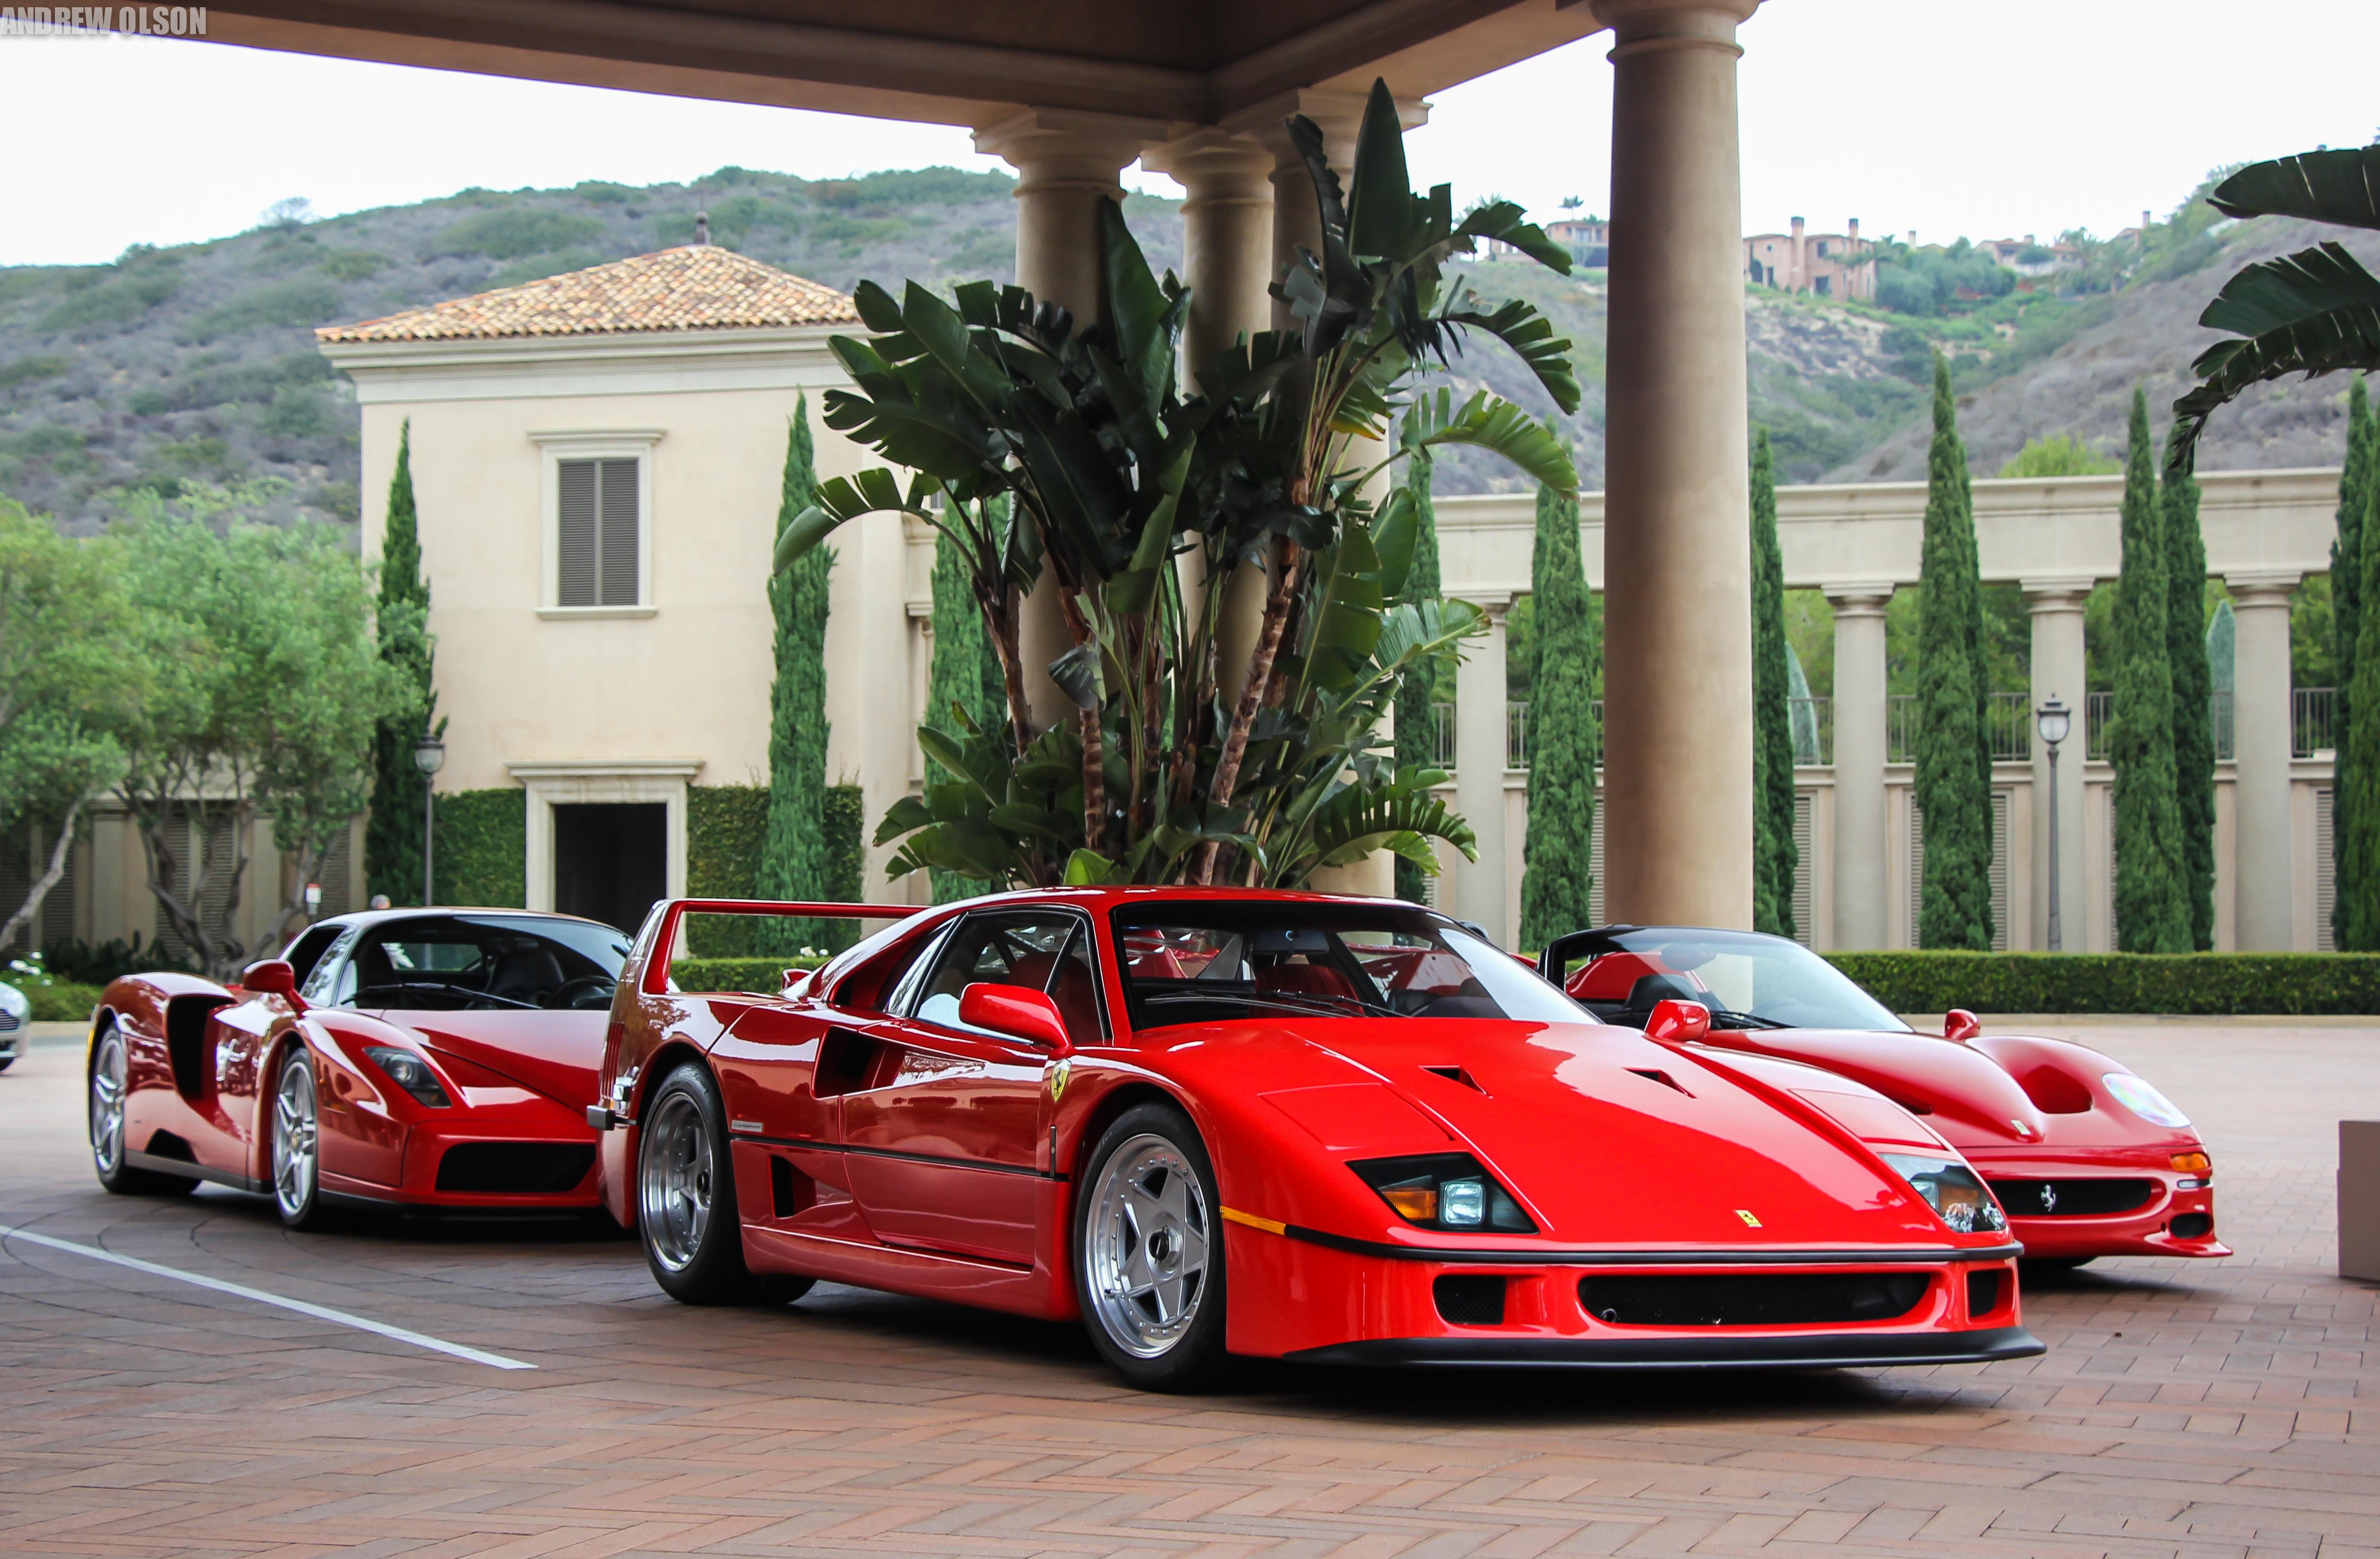 F40, F50, Enzo